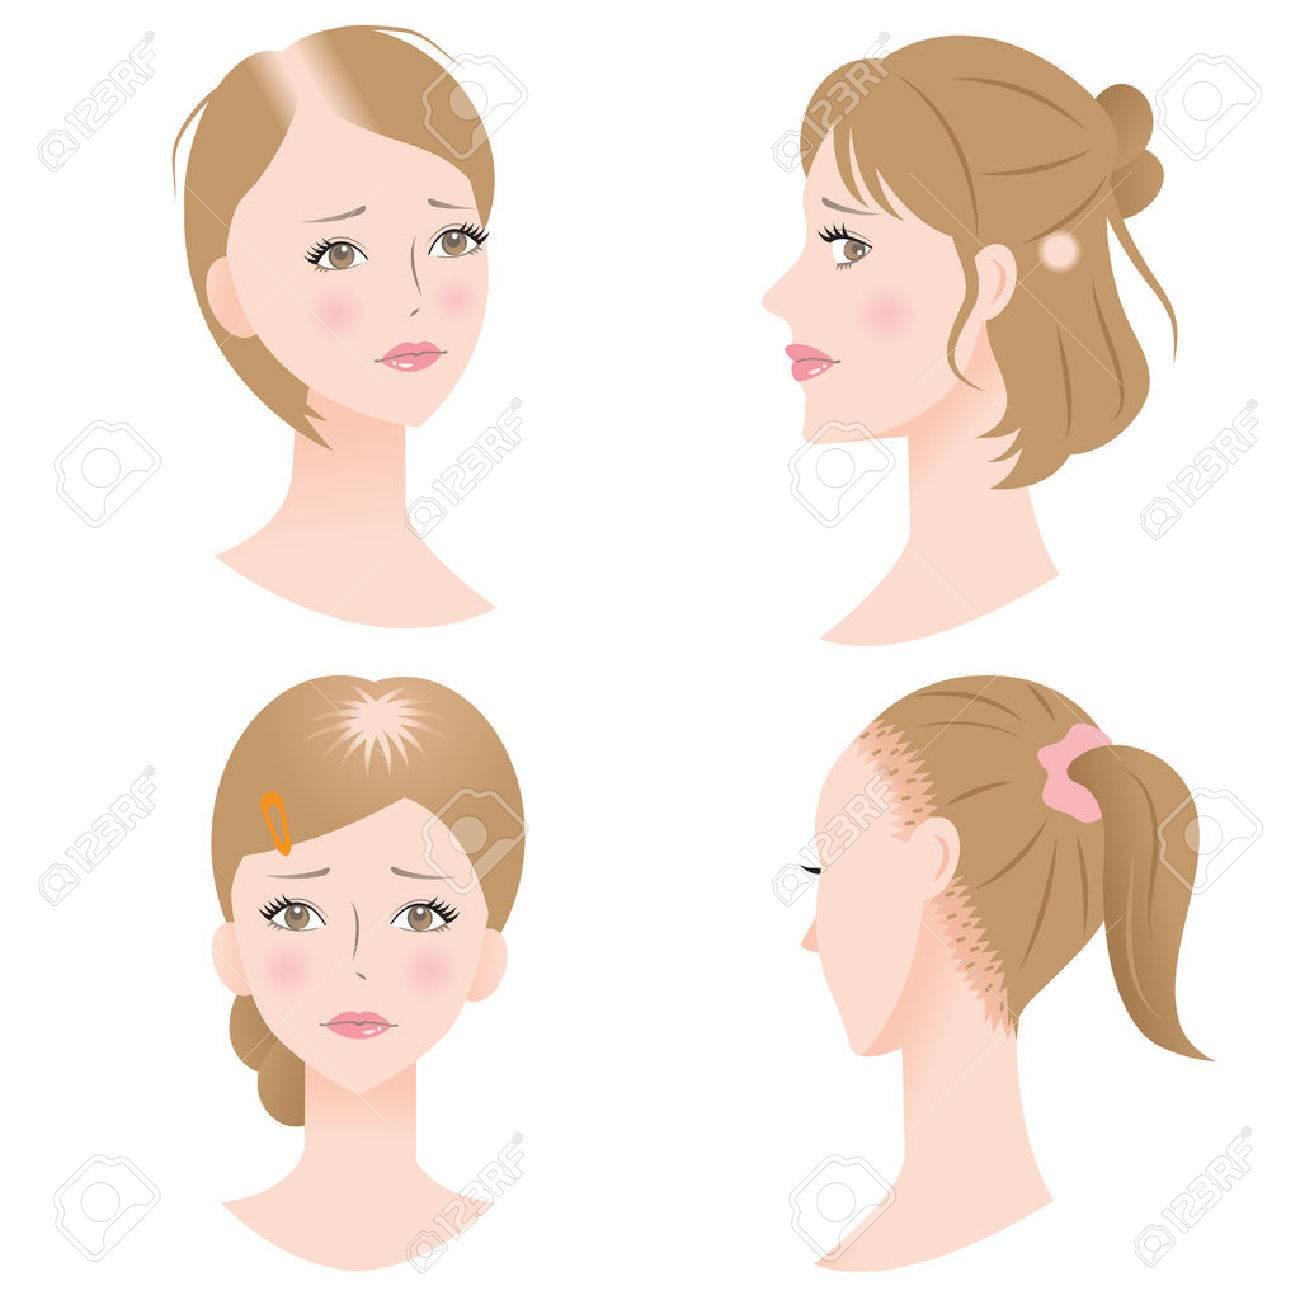 female hair loss - 64624990